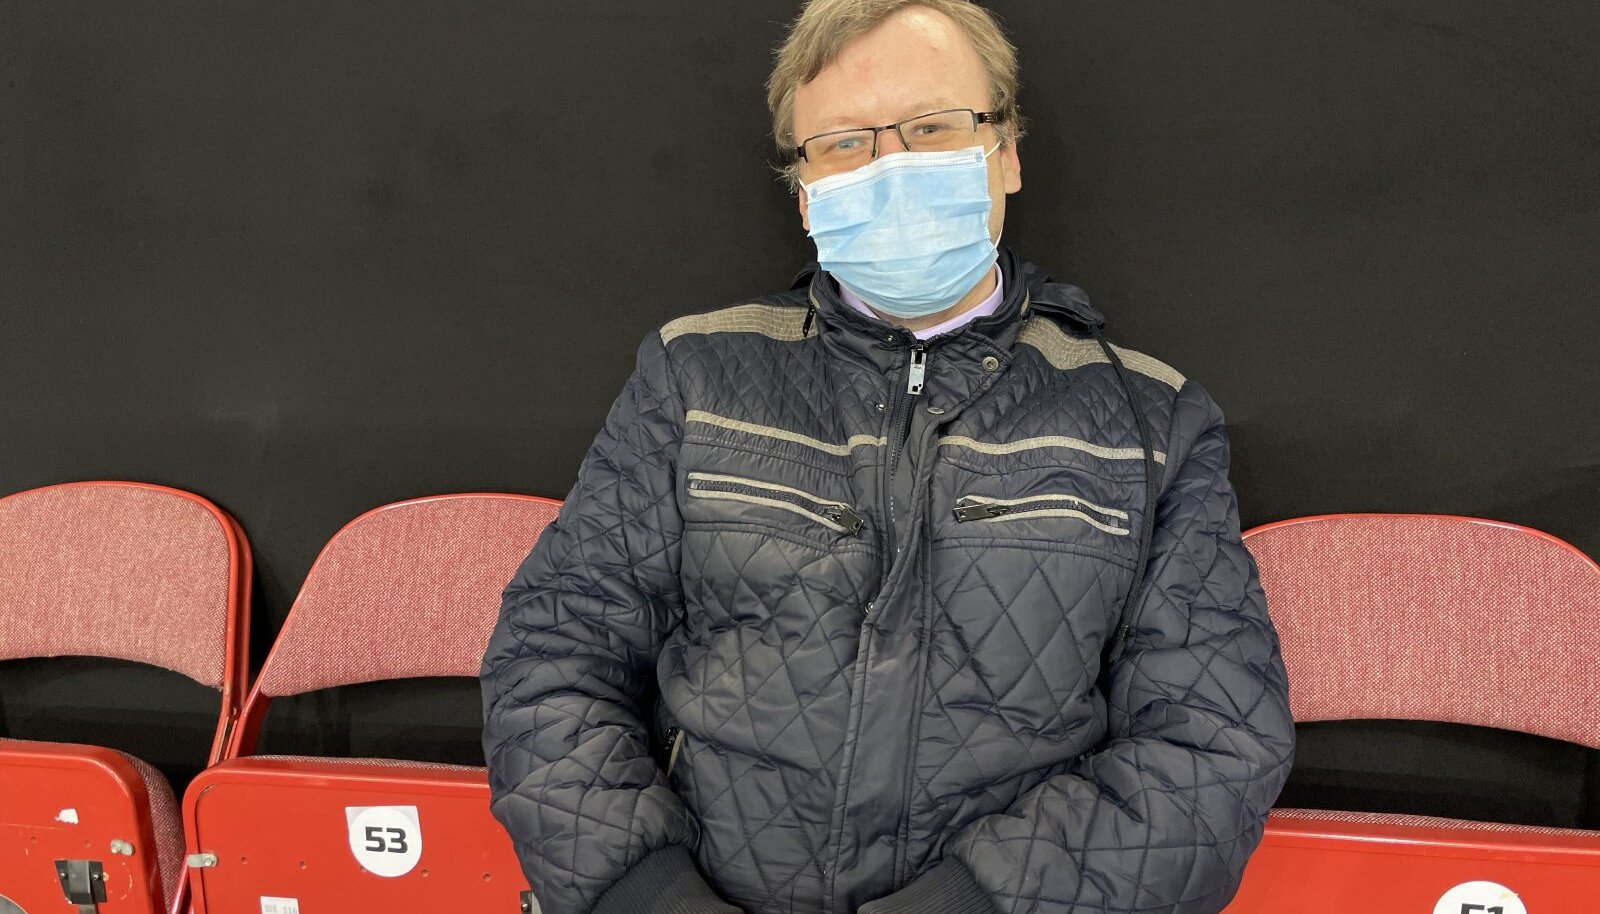 Одинокий Андрей Михайлов на трибуне